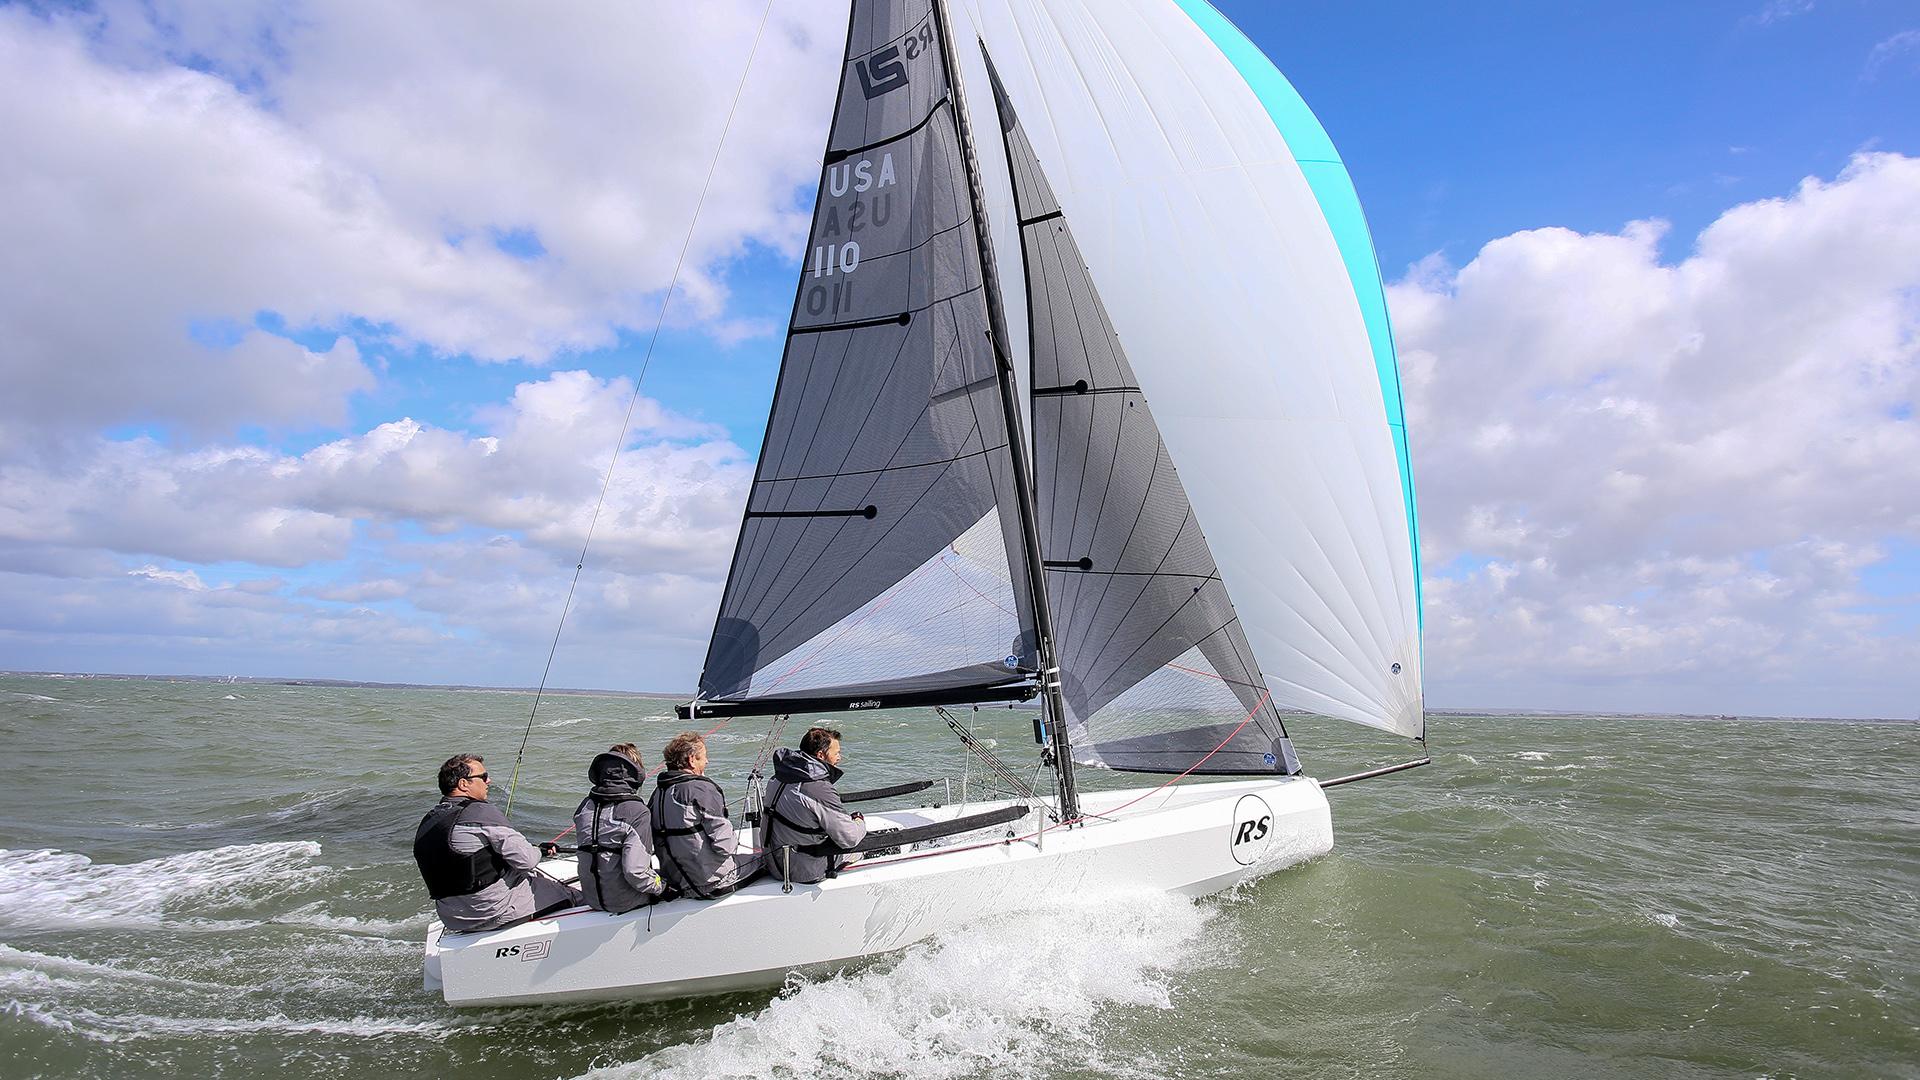 RS 21 Central Coast Sailing 14.jpg